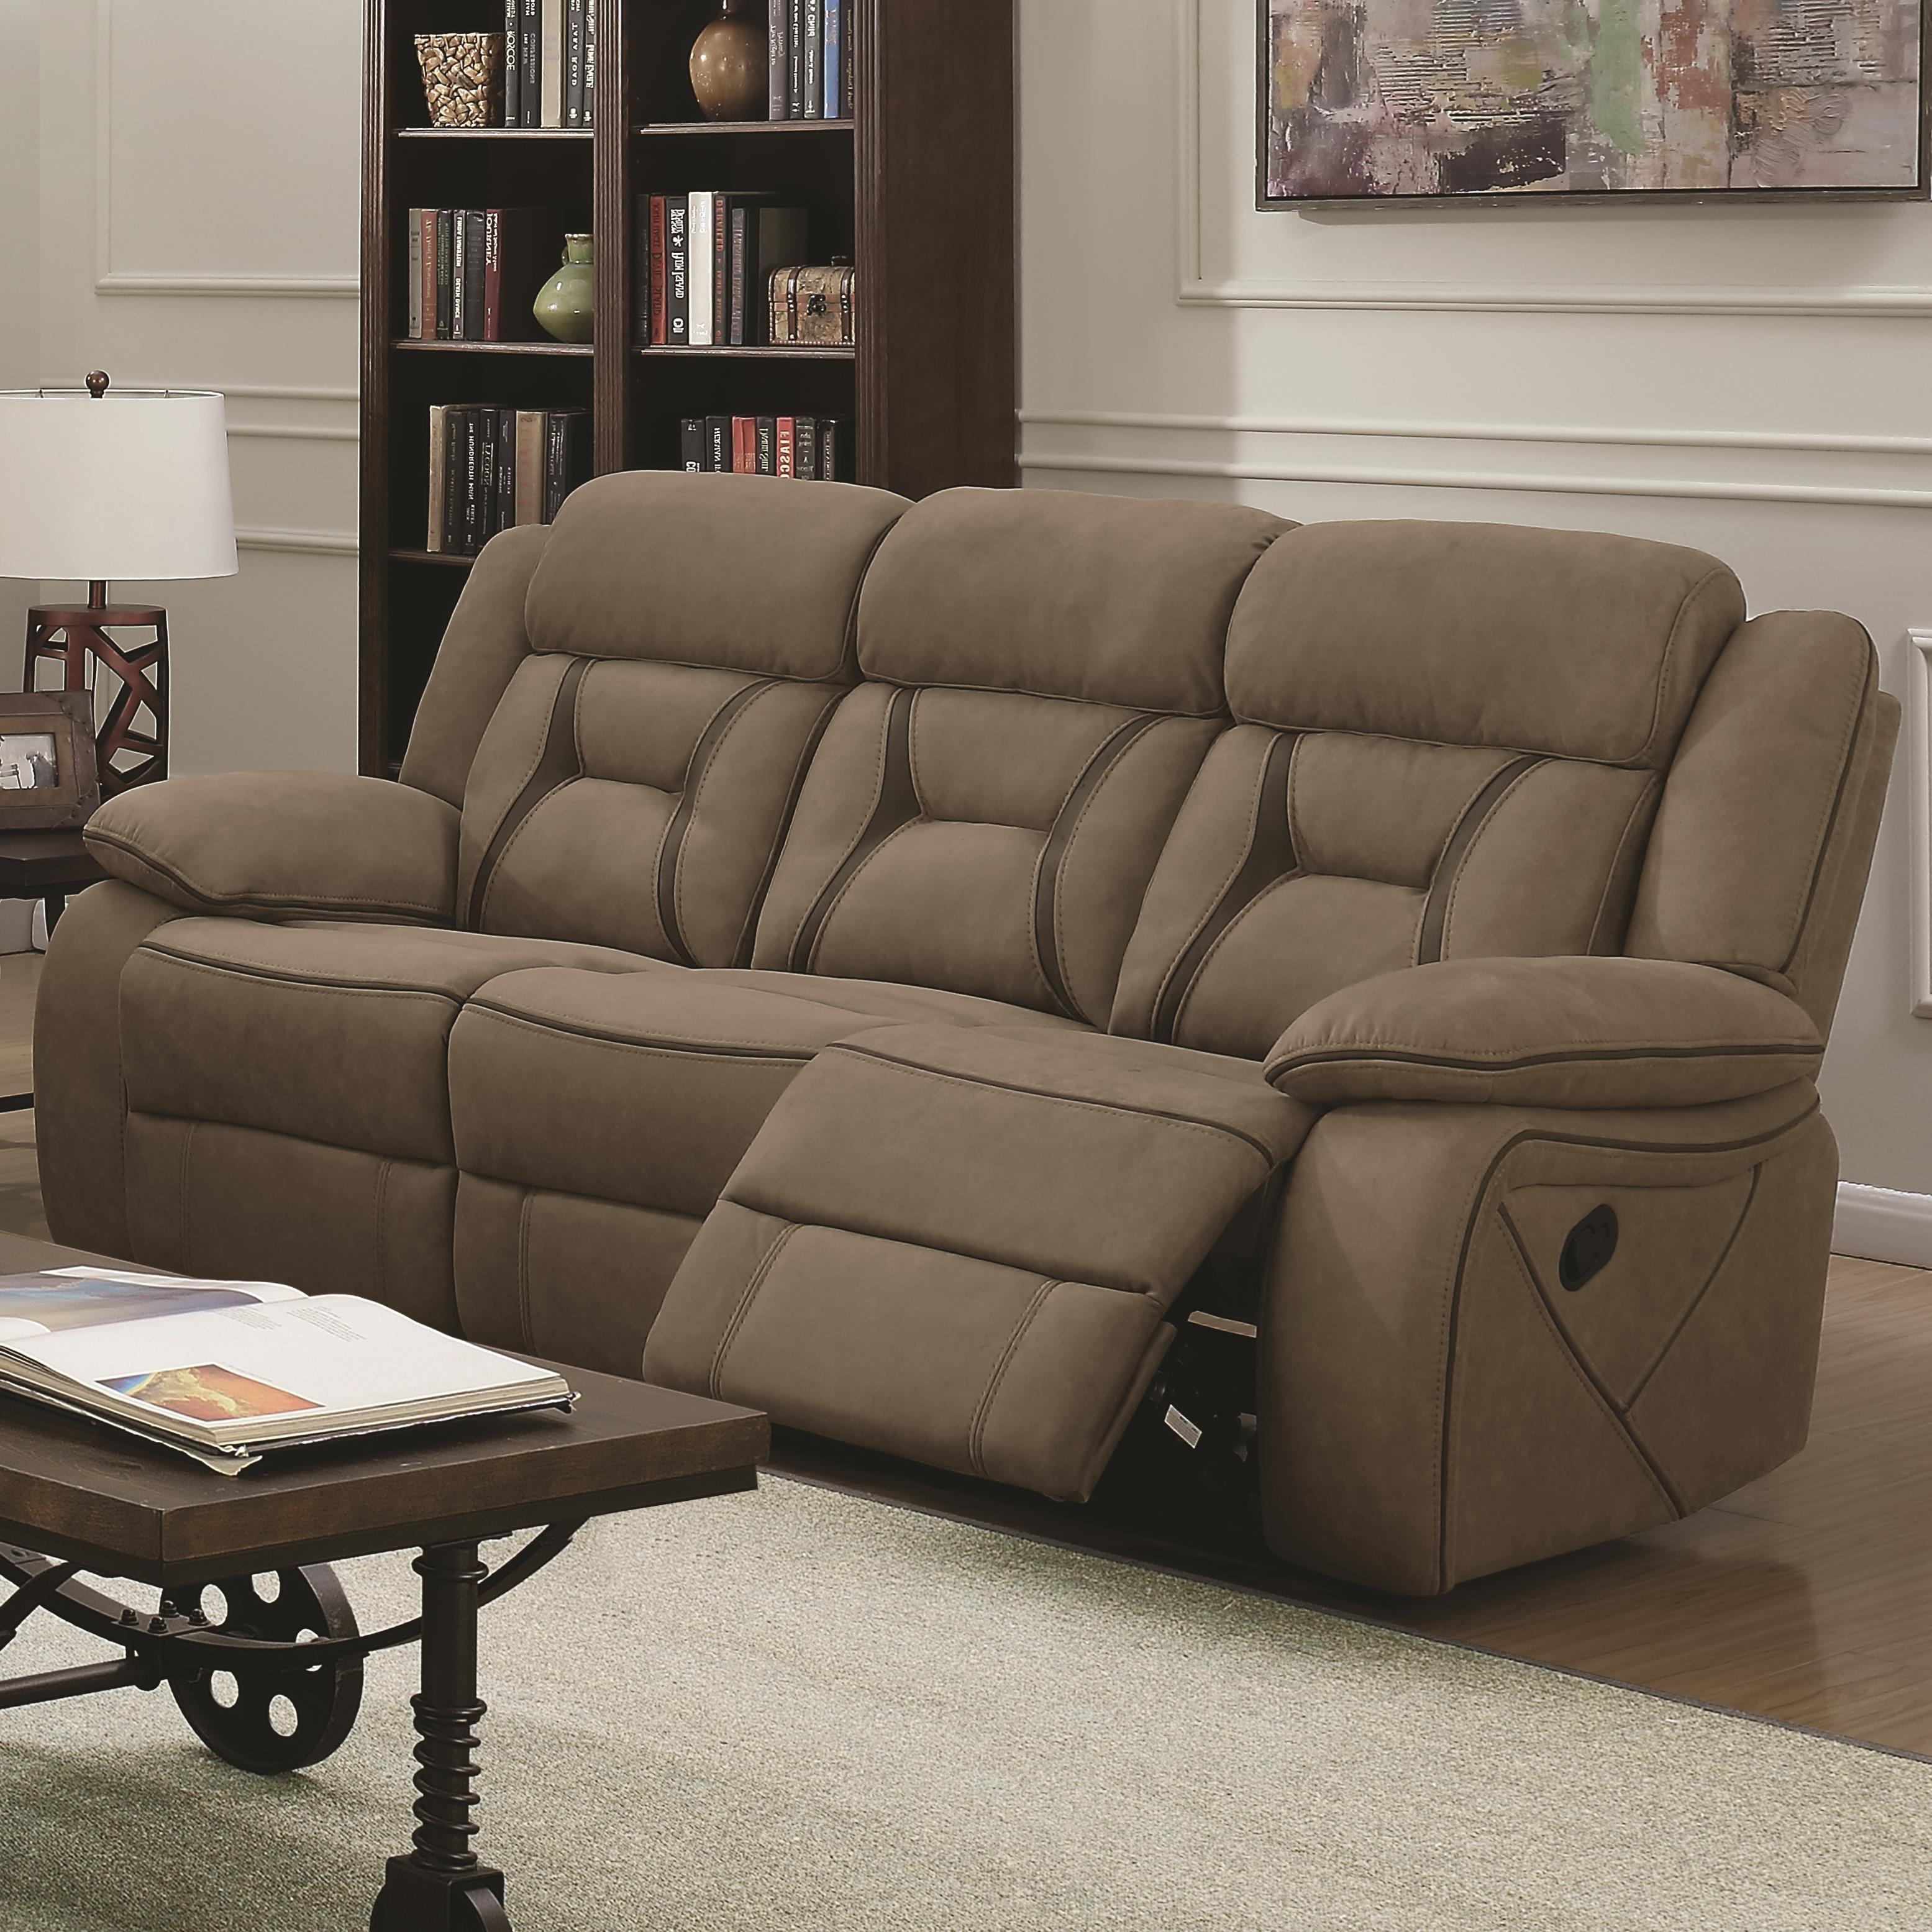 Houston Motion Sofa by Coaster at A1 Furniture & Mattress